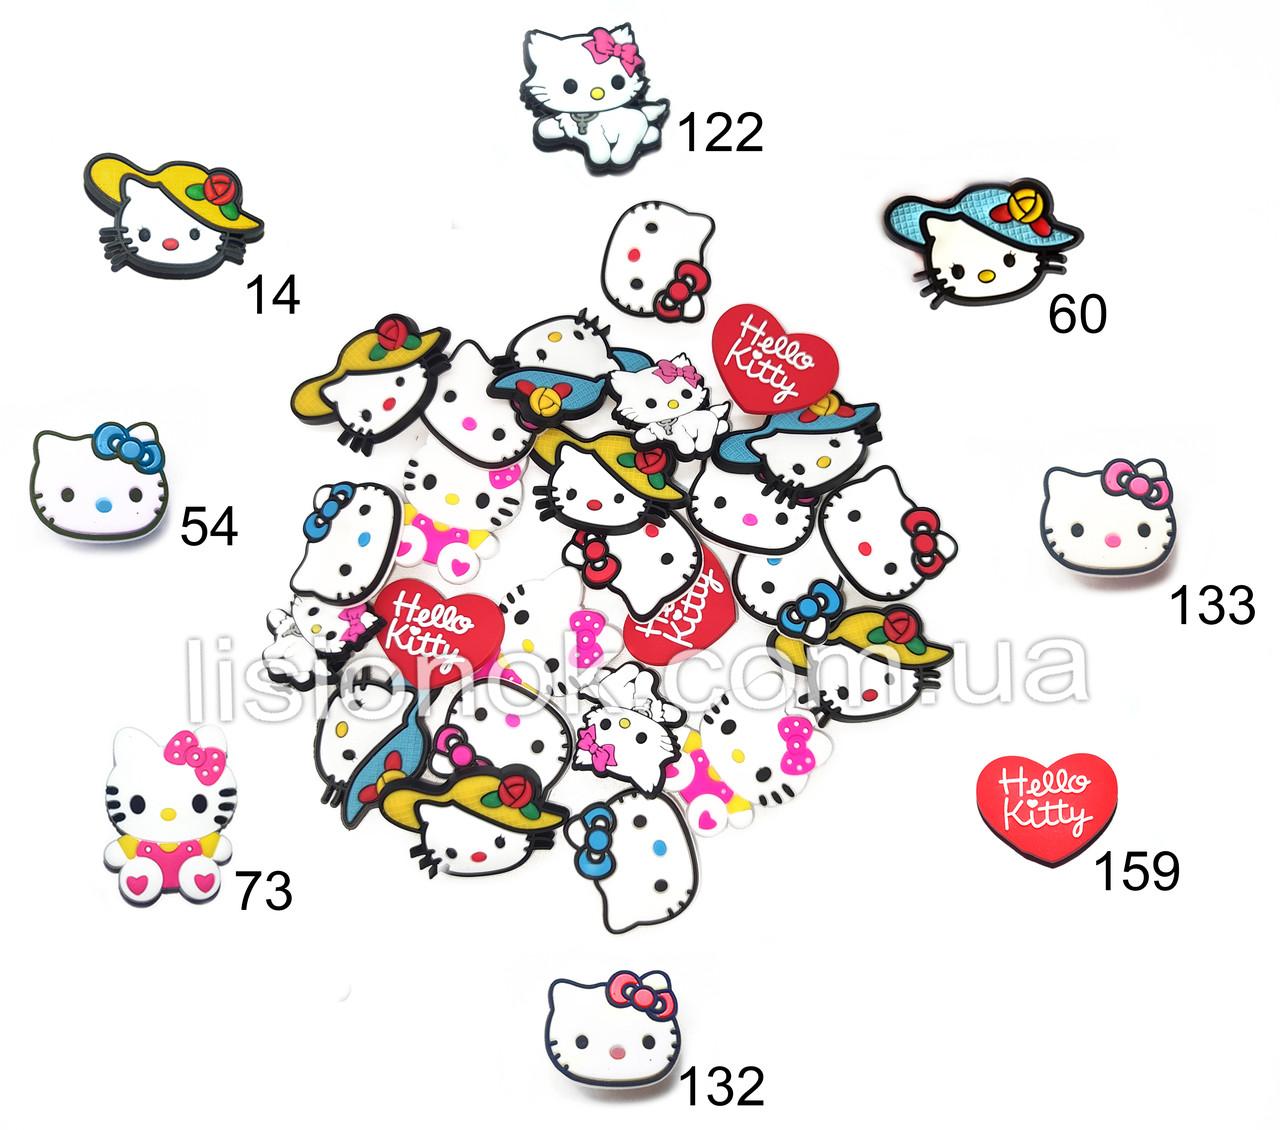 Джибитсы Hello Kitty, поштучно